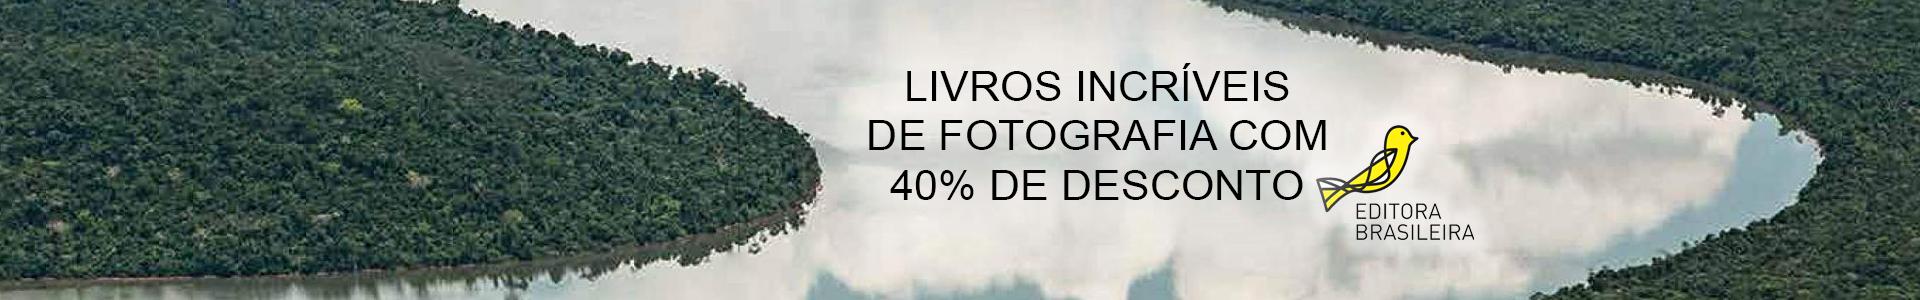 Brasileira - Desktop